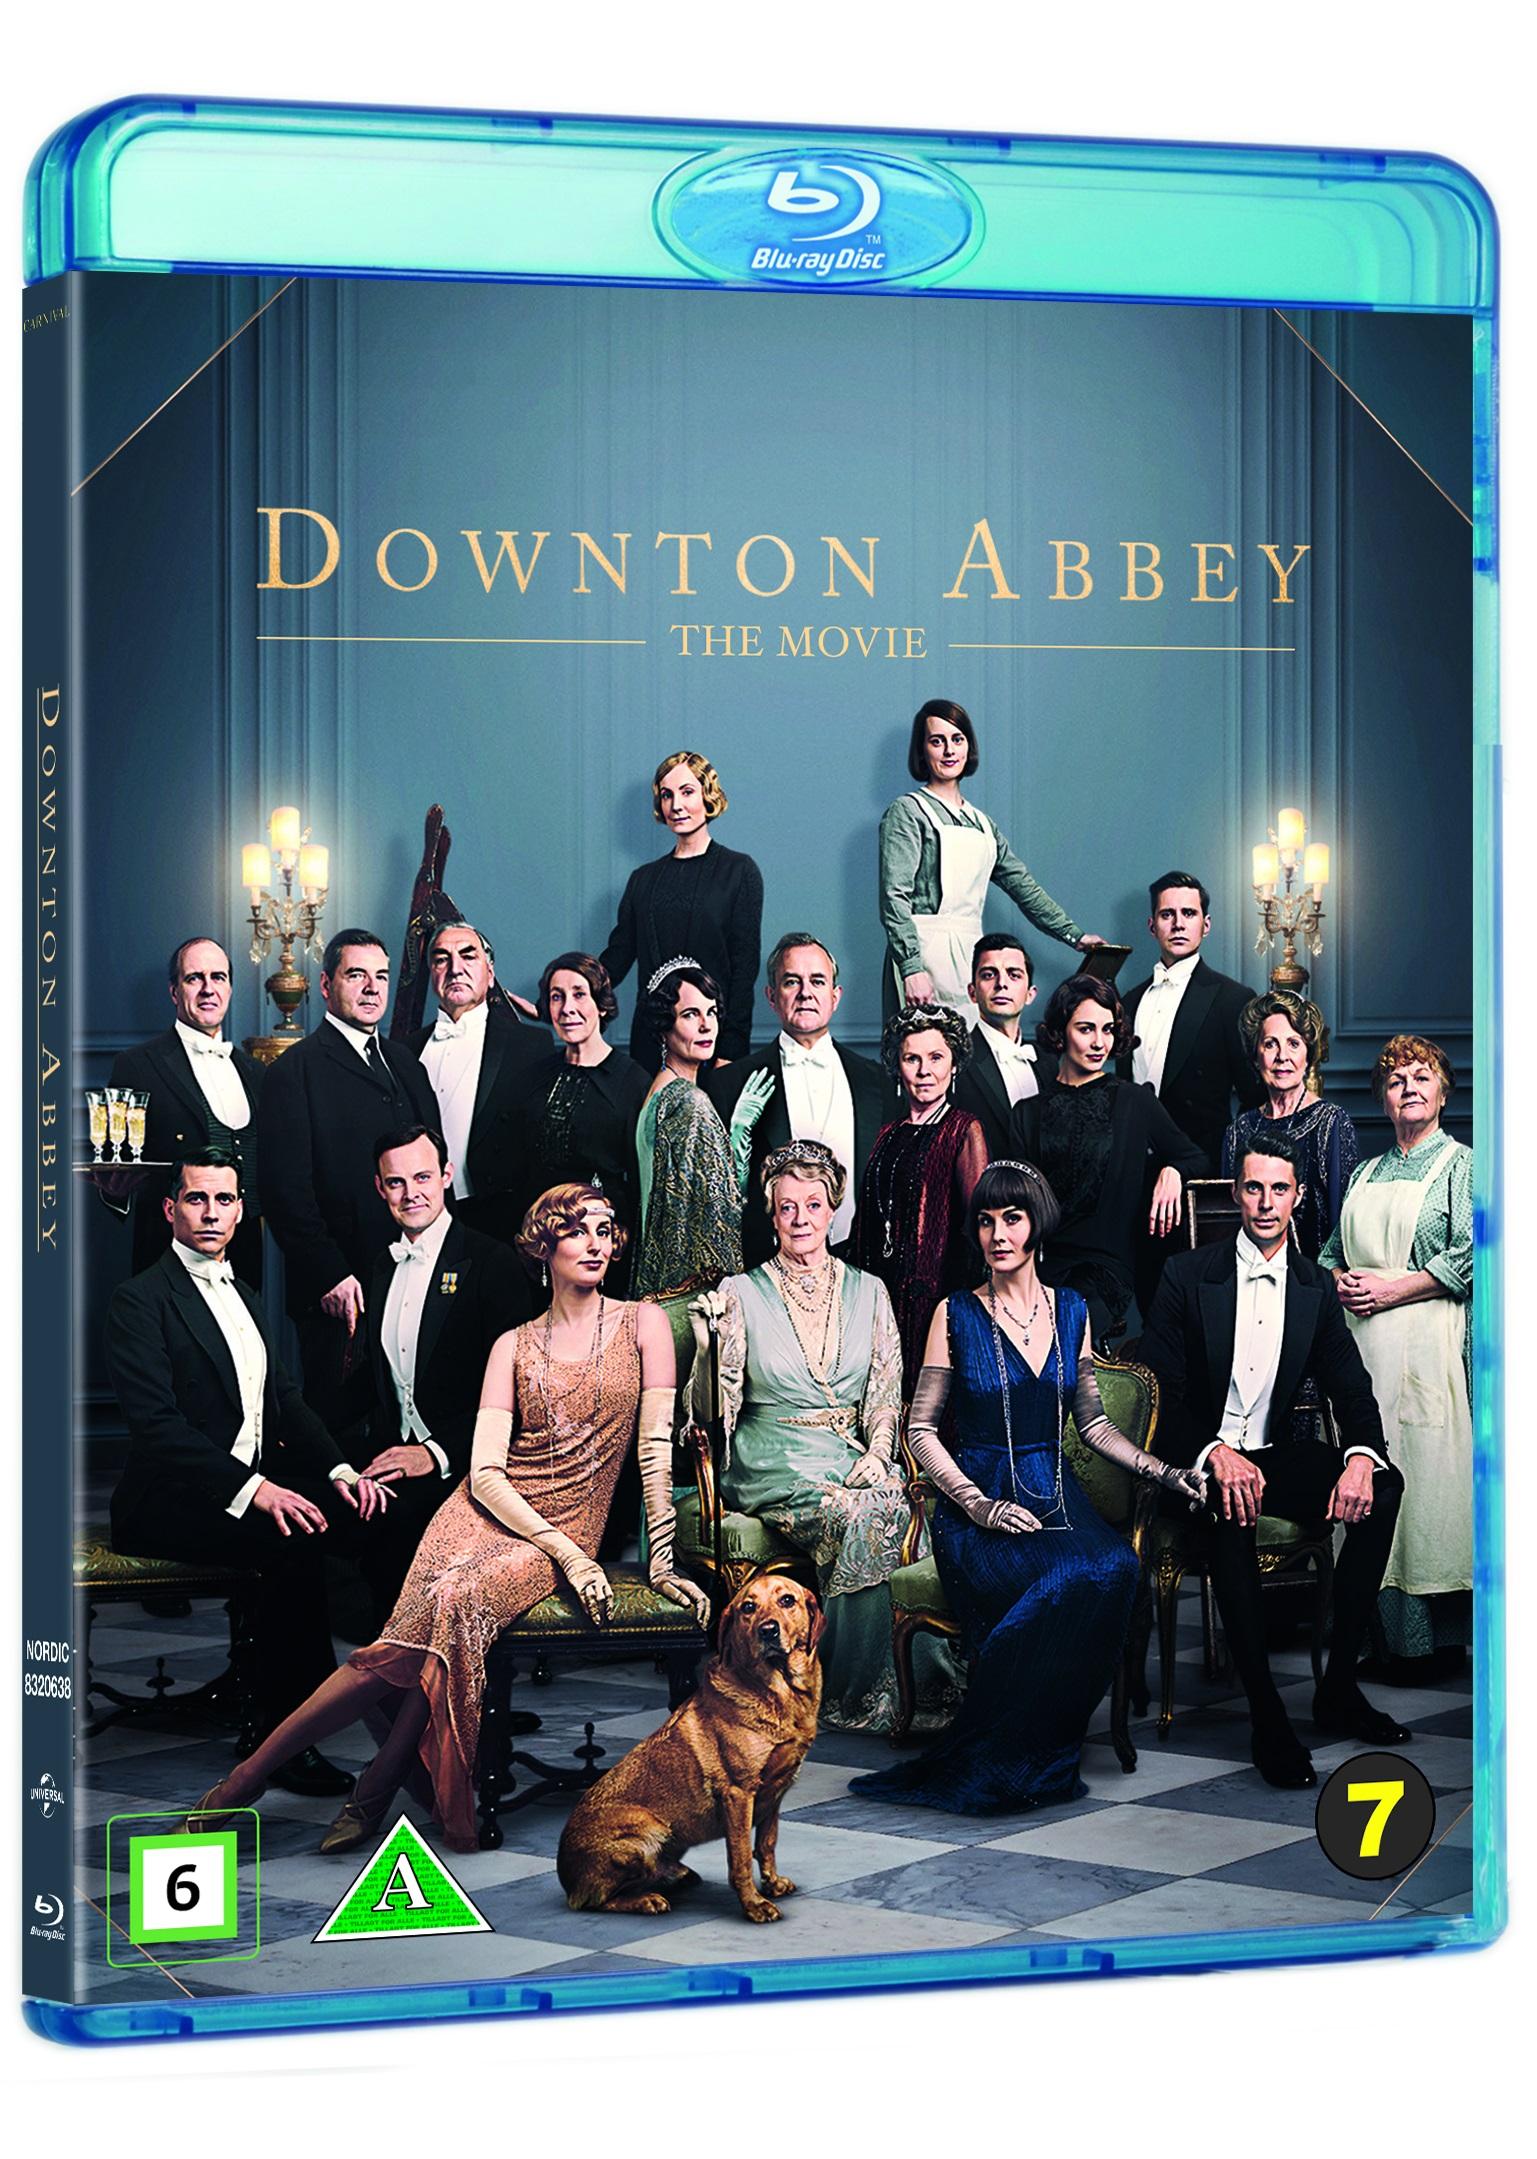 Downton Abbey -  - Film -  - 5053083206383 - 6/2-2020